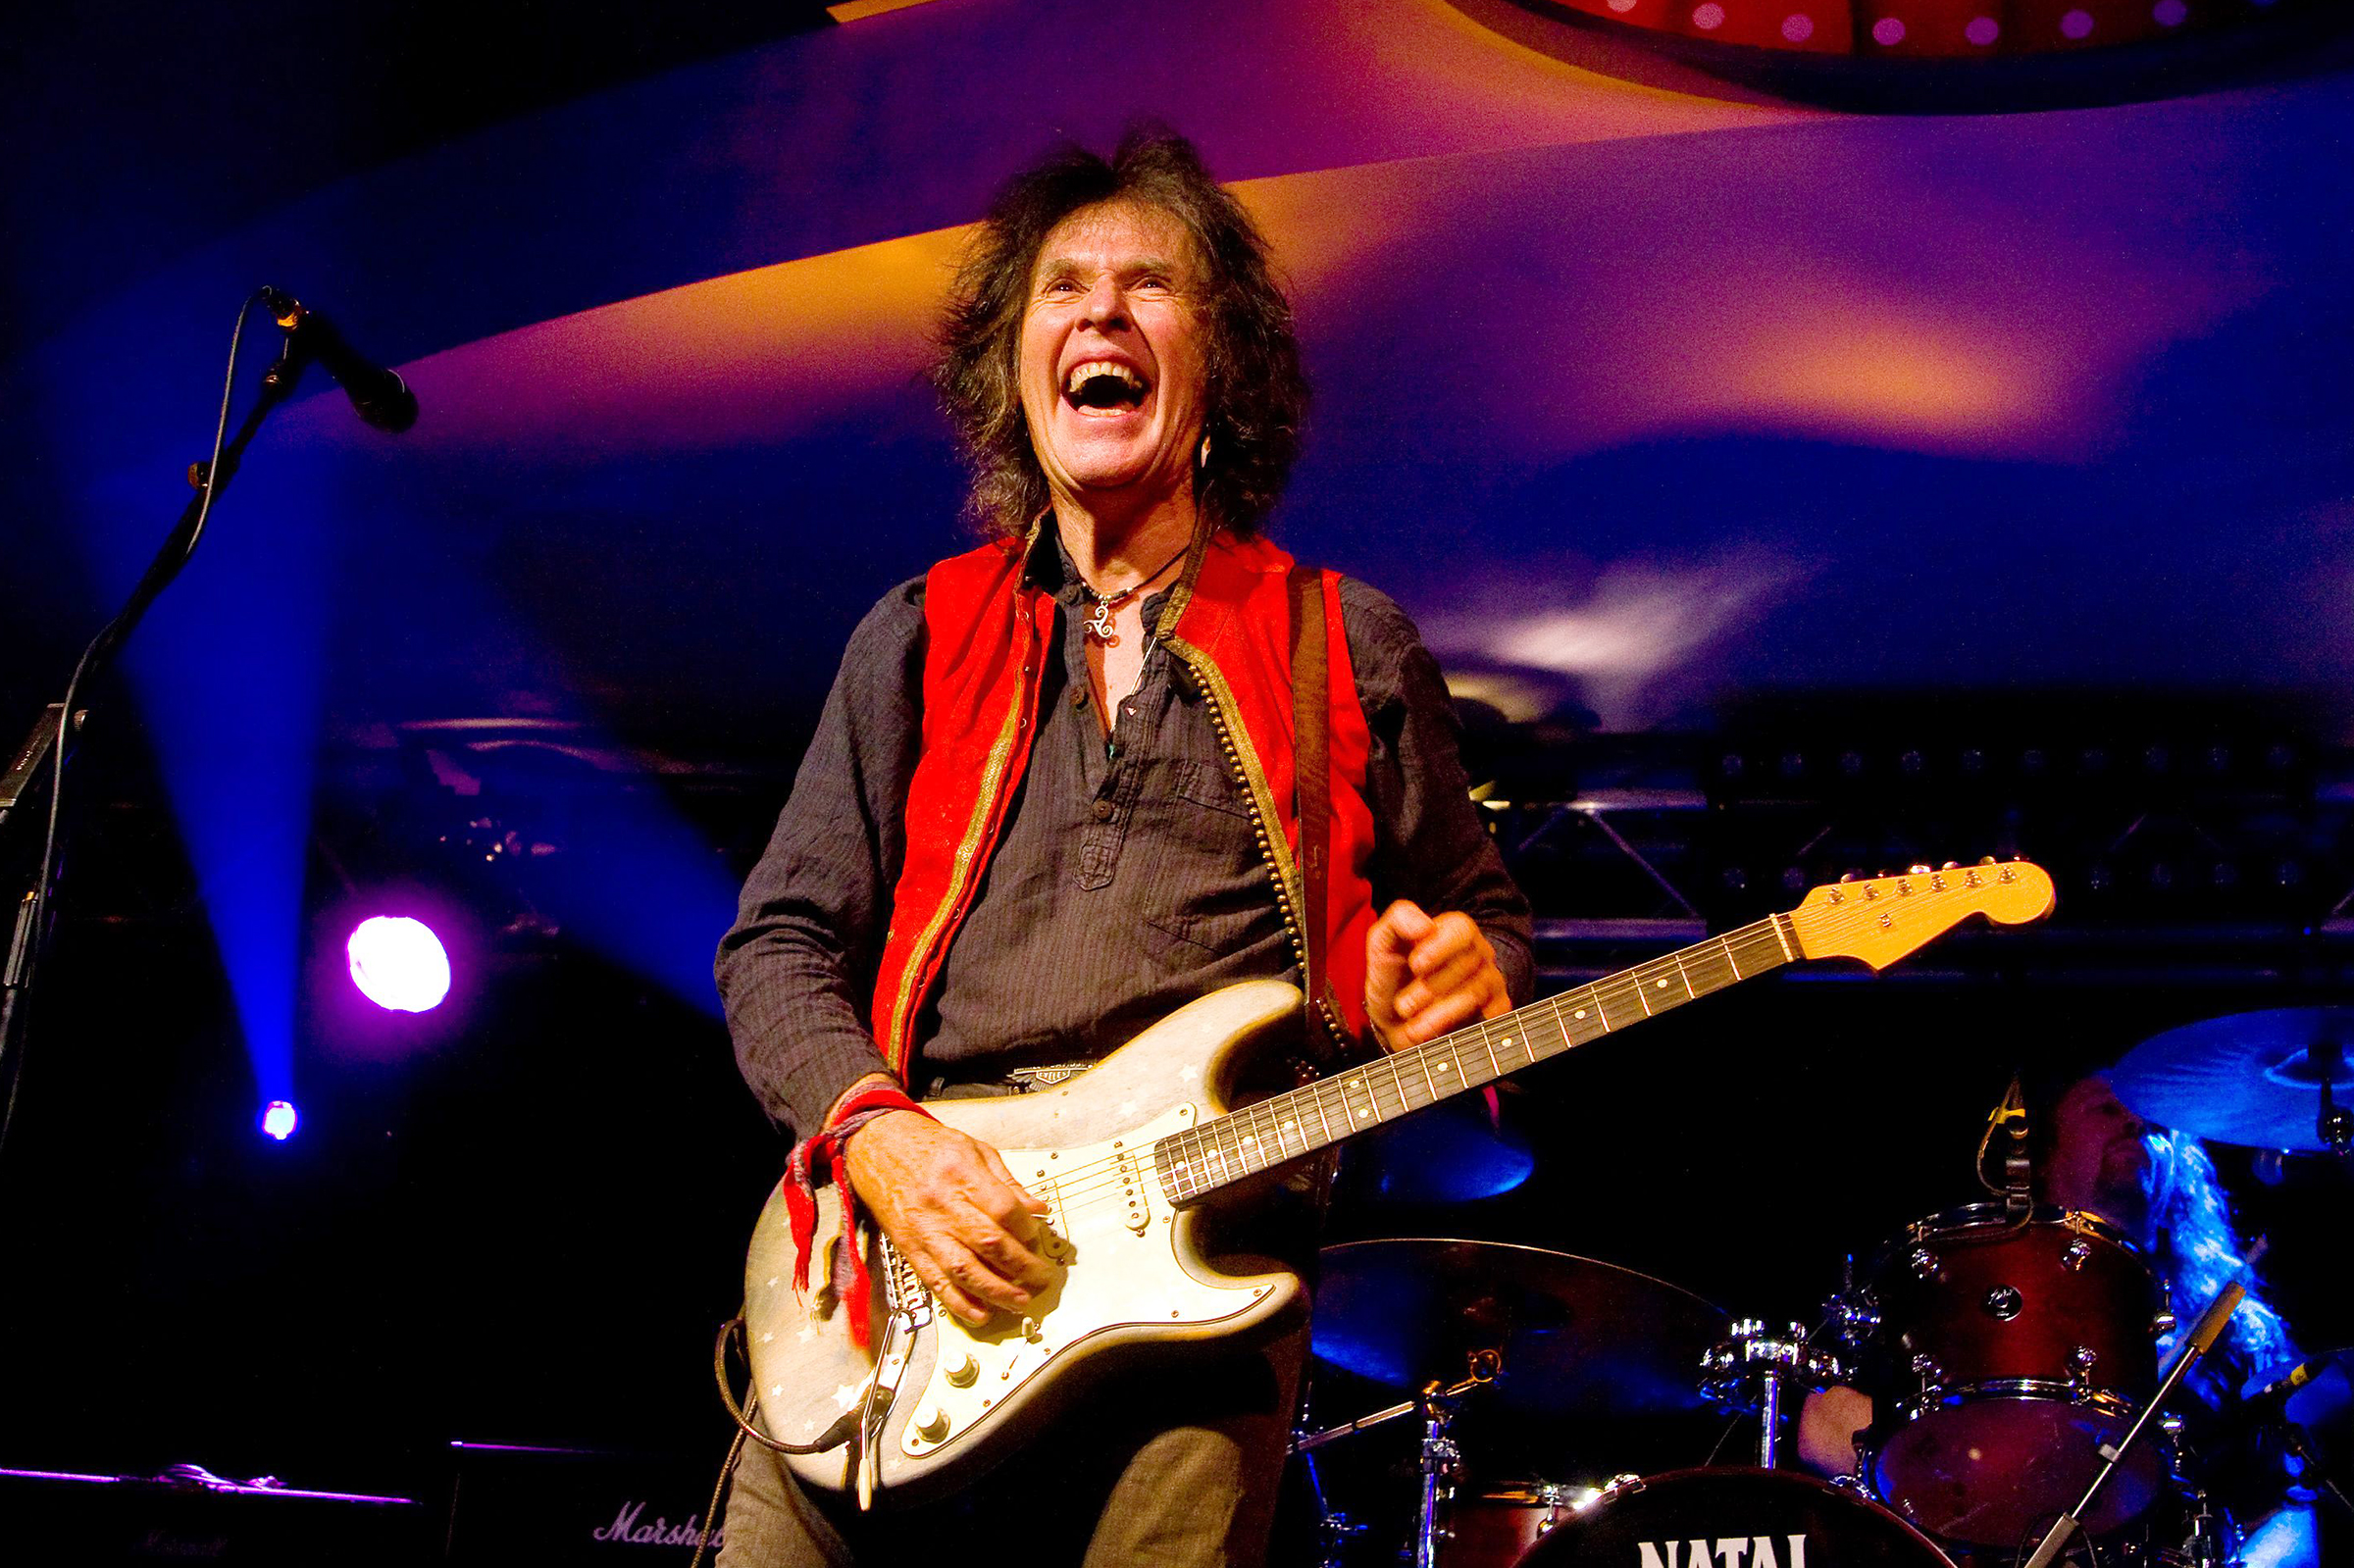 Bernie Torme, Ozzy Osbourne and Ian Gillan Guitarist, Dead at 66